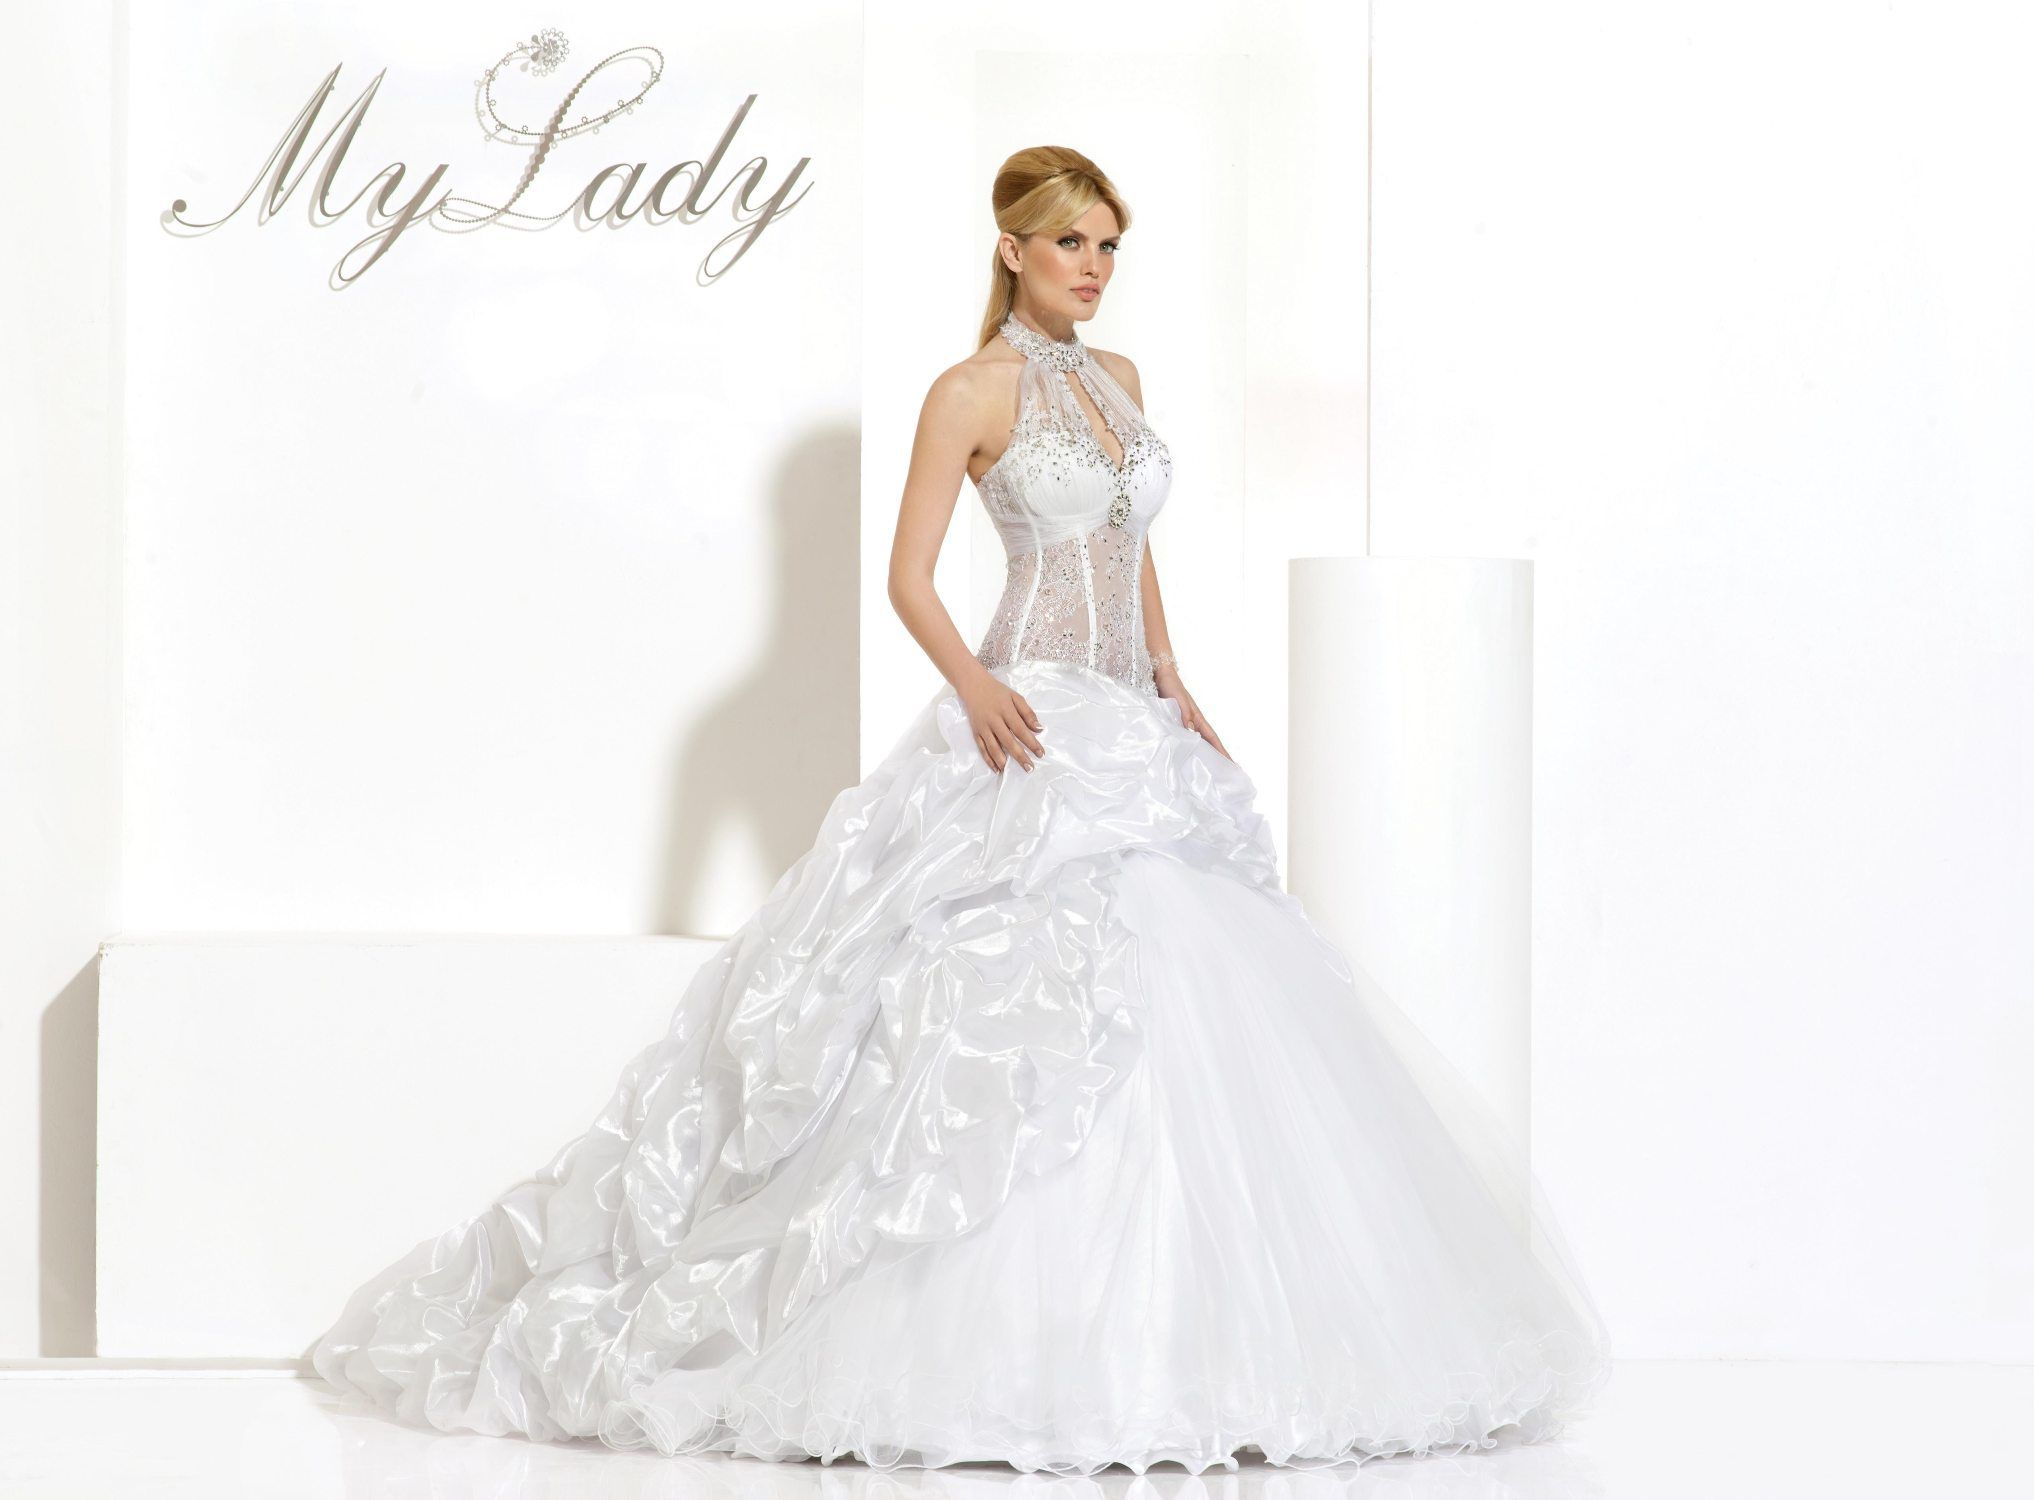 Shruthi In A Dreamy One Shoulder Pronovias Dress: BRIDAL DRESS BY MY LADY LADY DEKEL